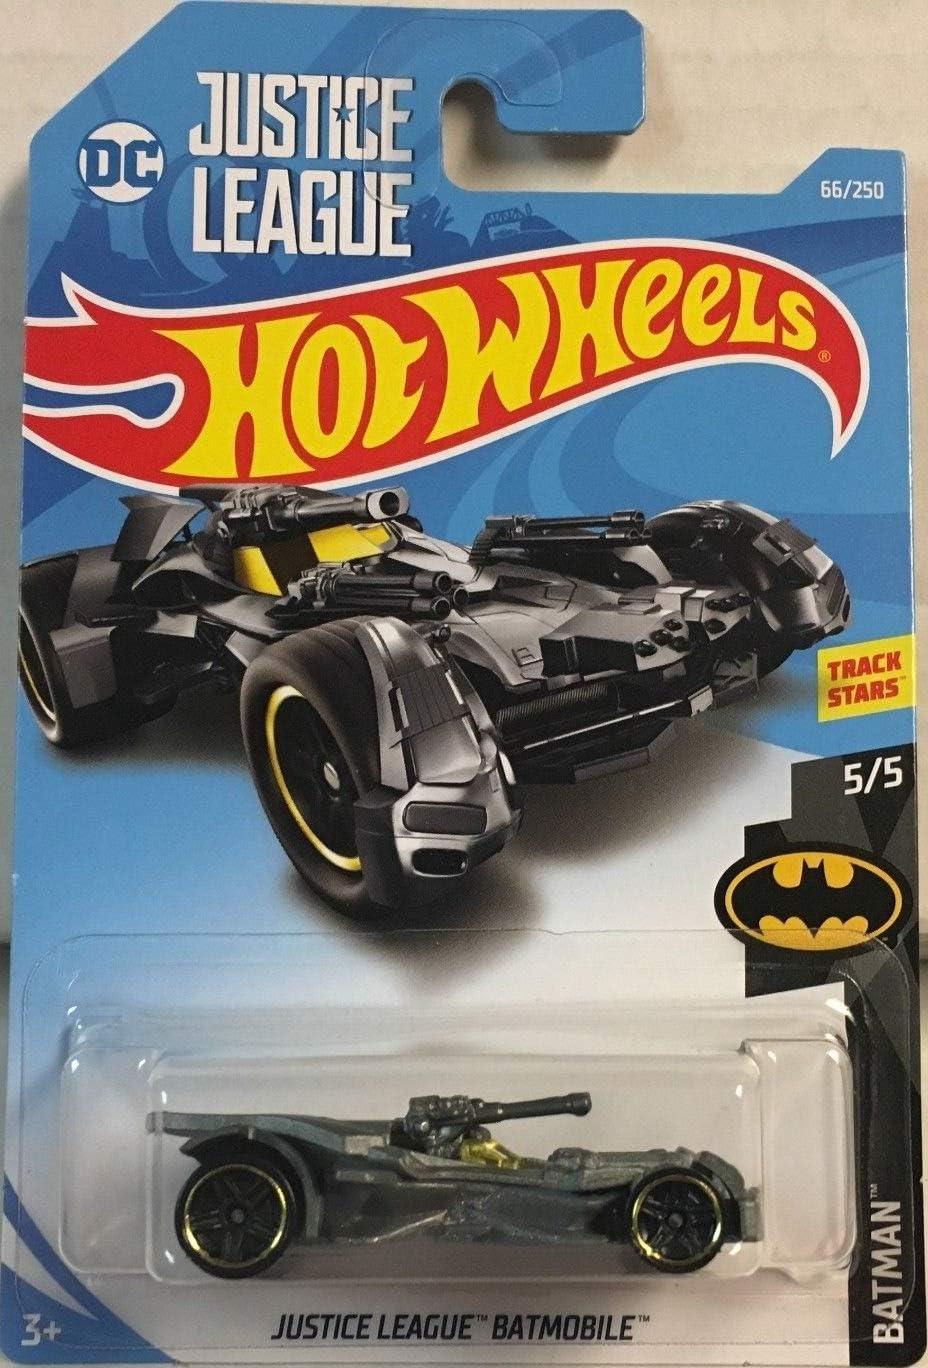 Hot Wheels Justice League Batmobile Vehicle